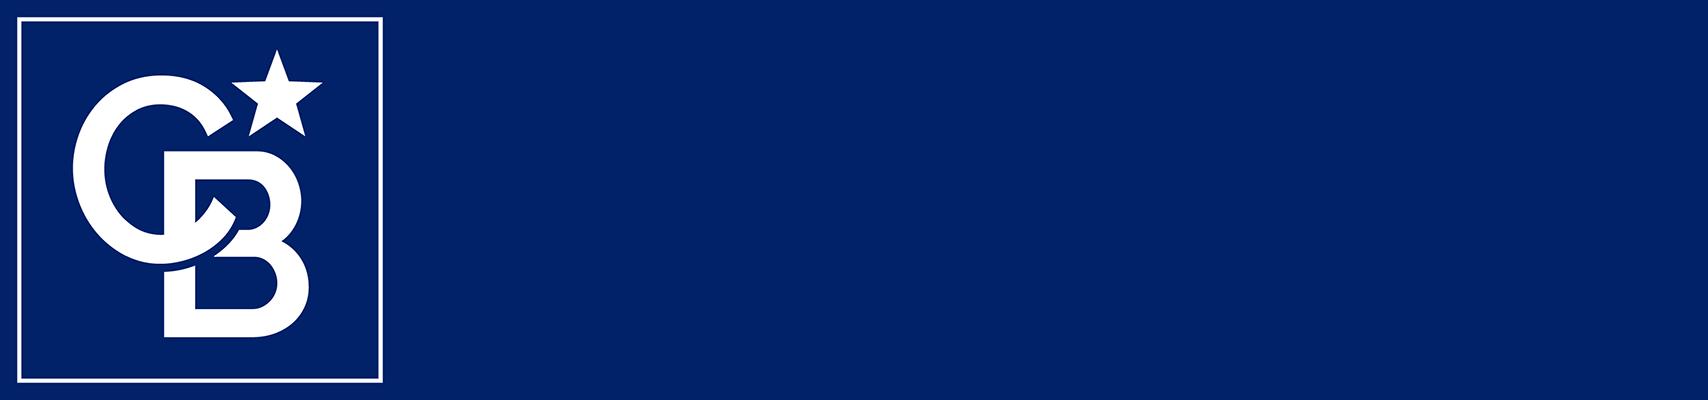 Logo_151029_Jim_Henry_Associates_HZ_STK_BLU_RGB_FR